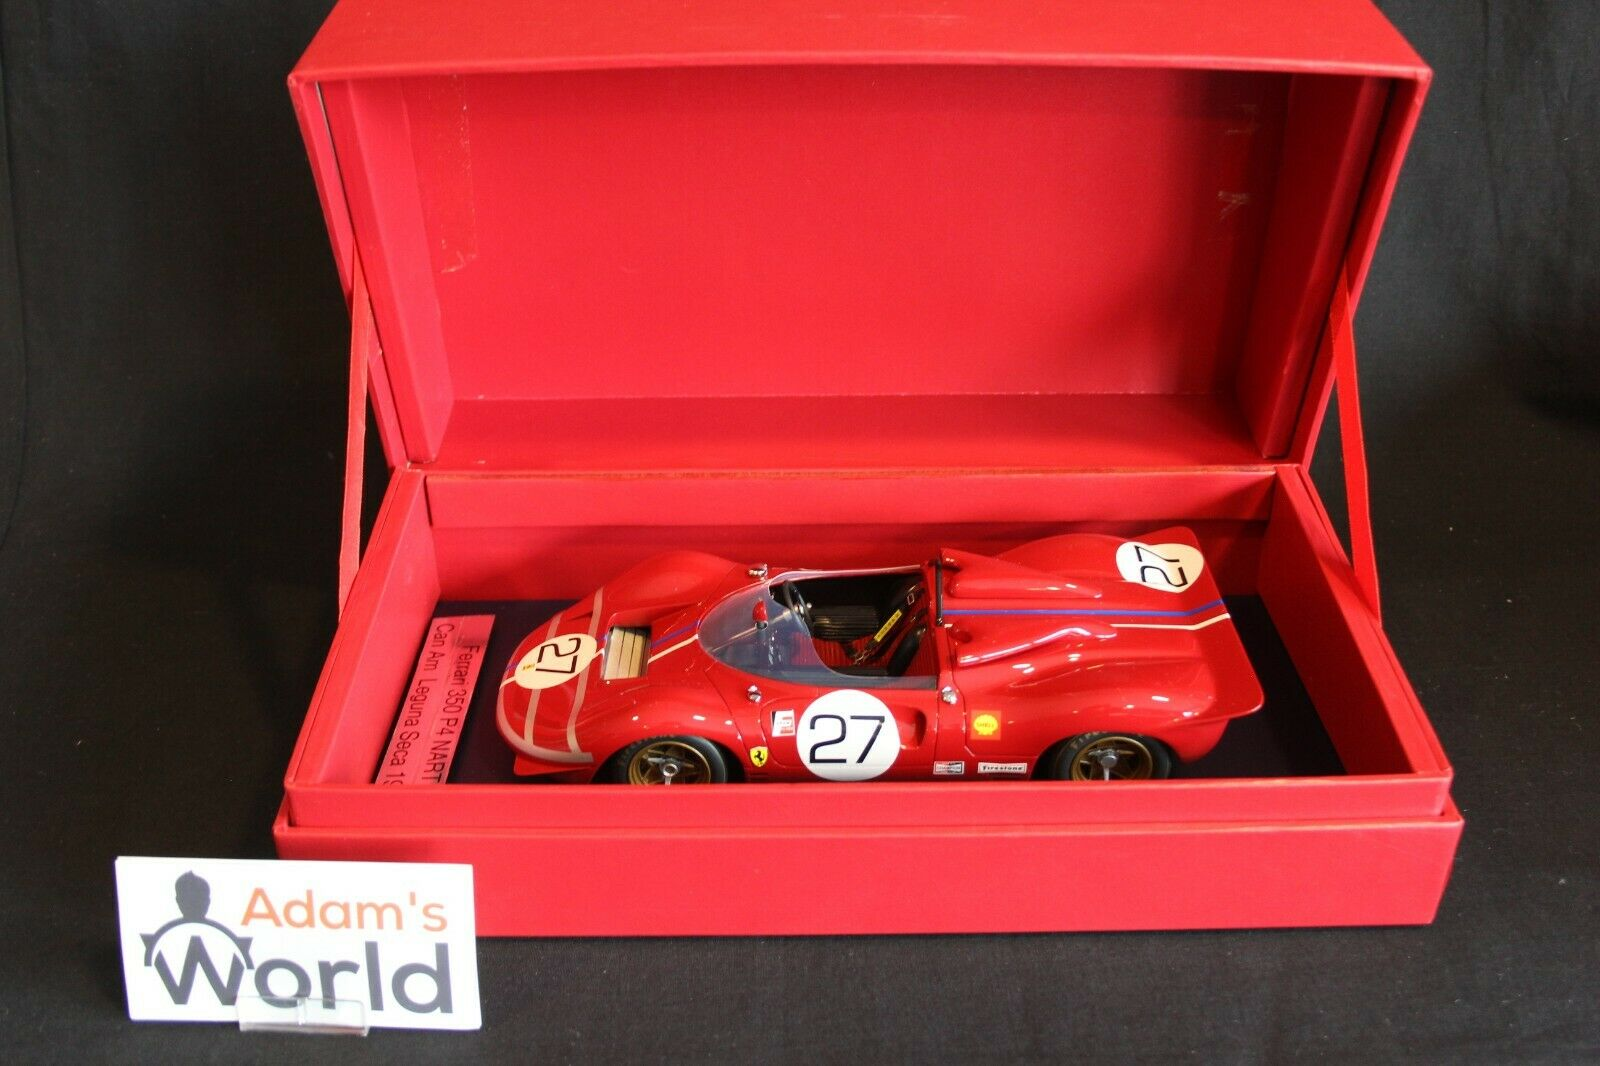 PT-models Ferrari 350 P4 Can Am 1967 1 18 Jonathan Williams (GBR) (PJBB)